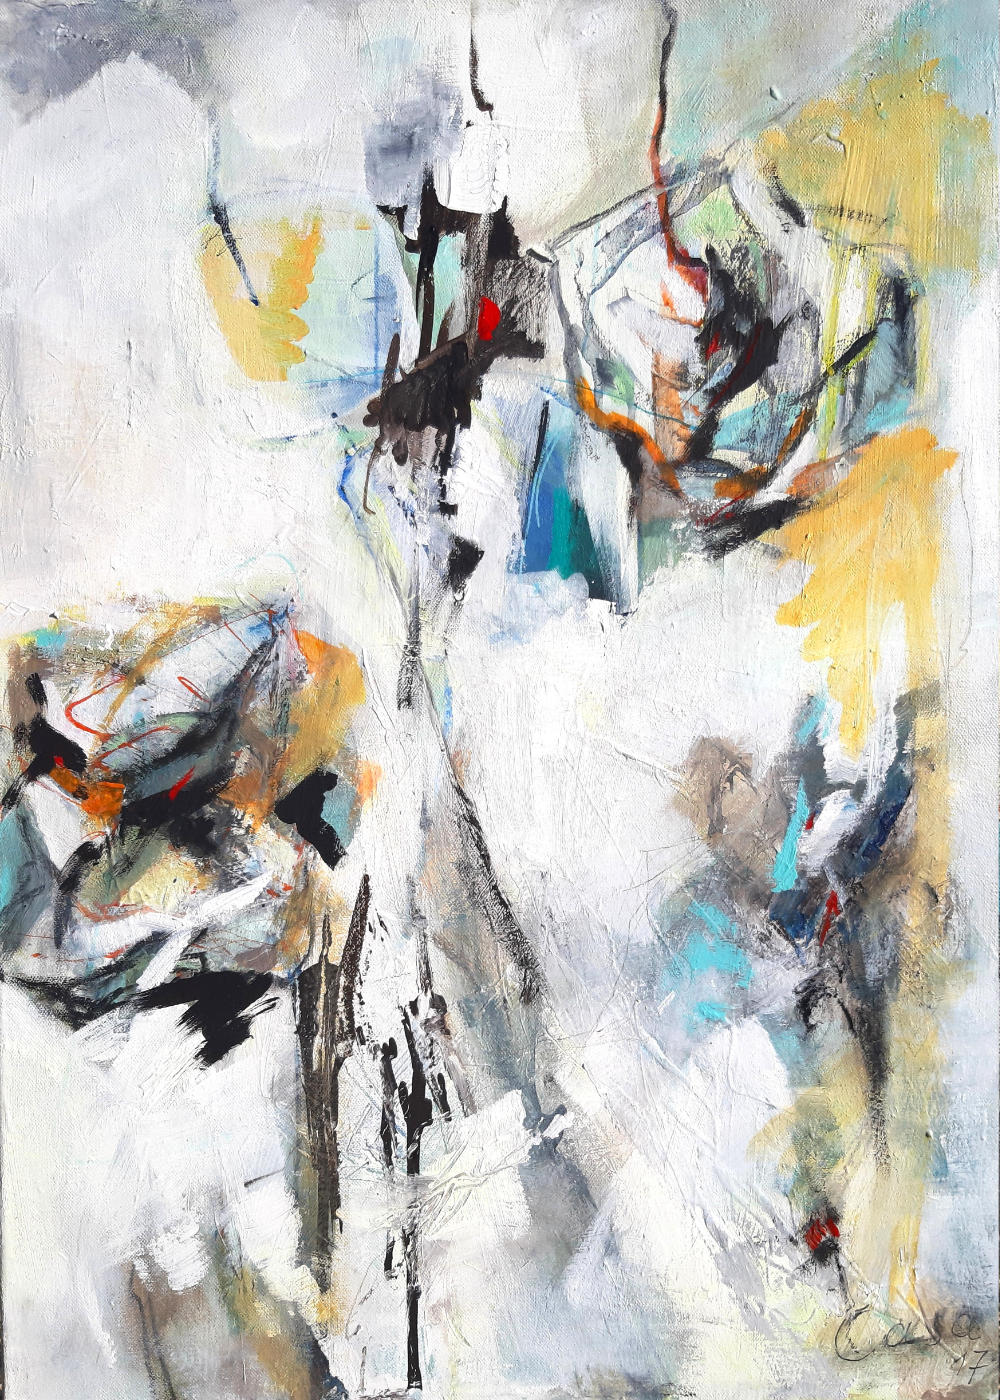 Rosen Stufen - Acryl mixed media auf Leinwand, 70x50cm